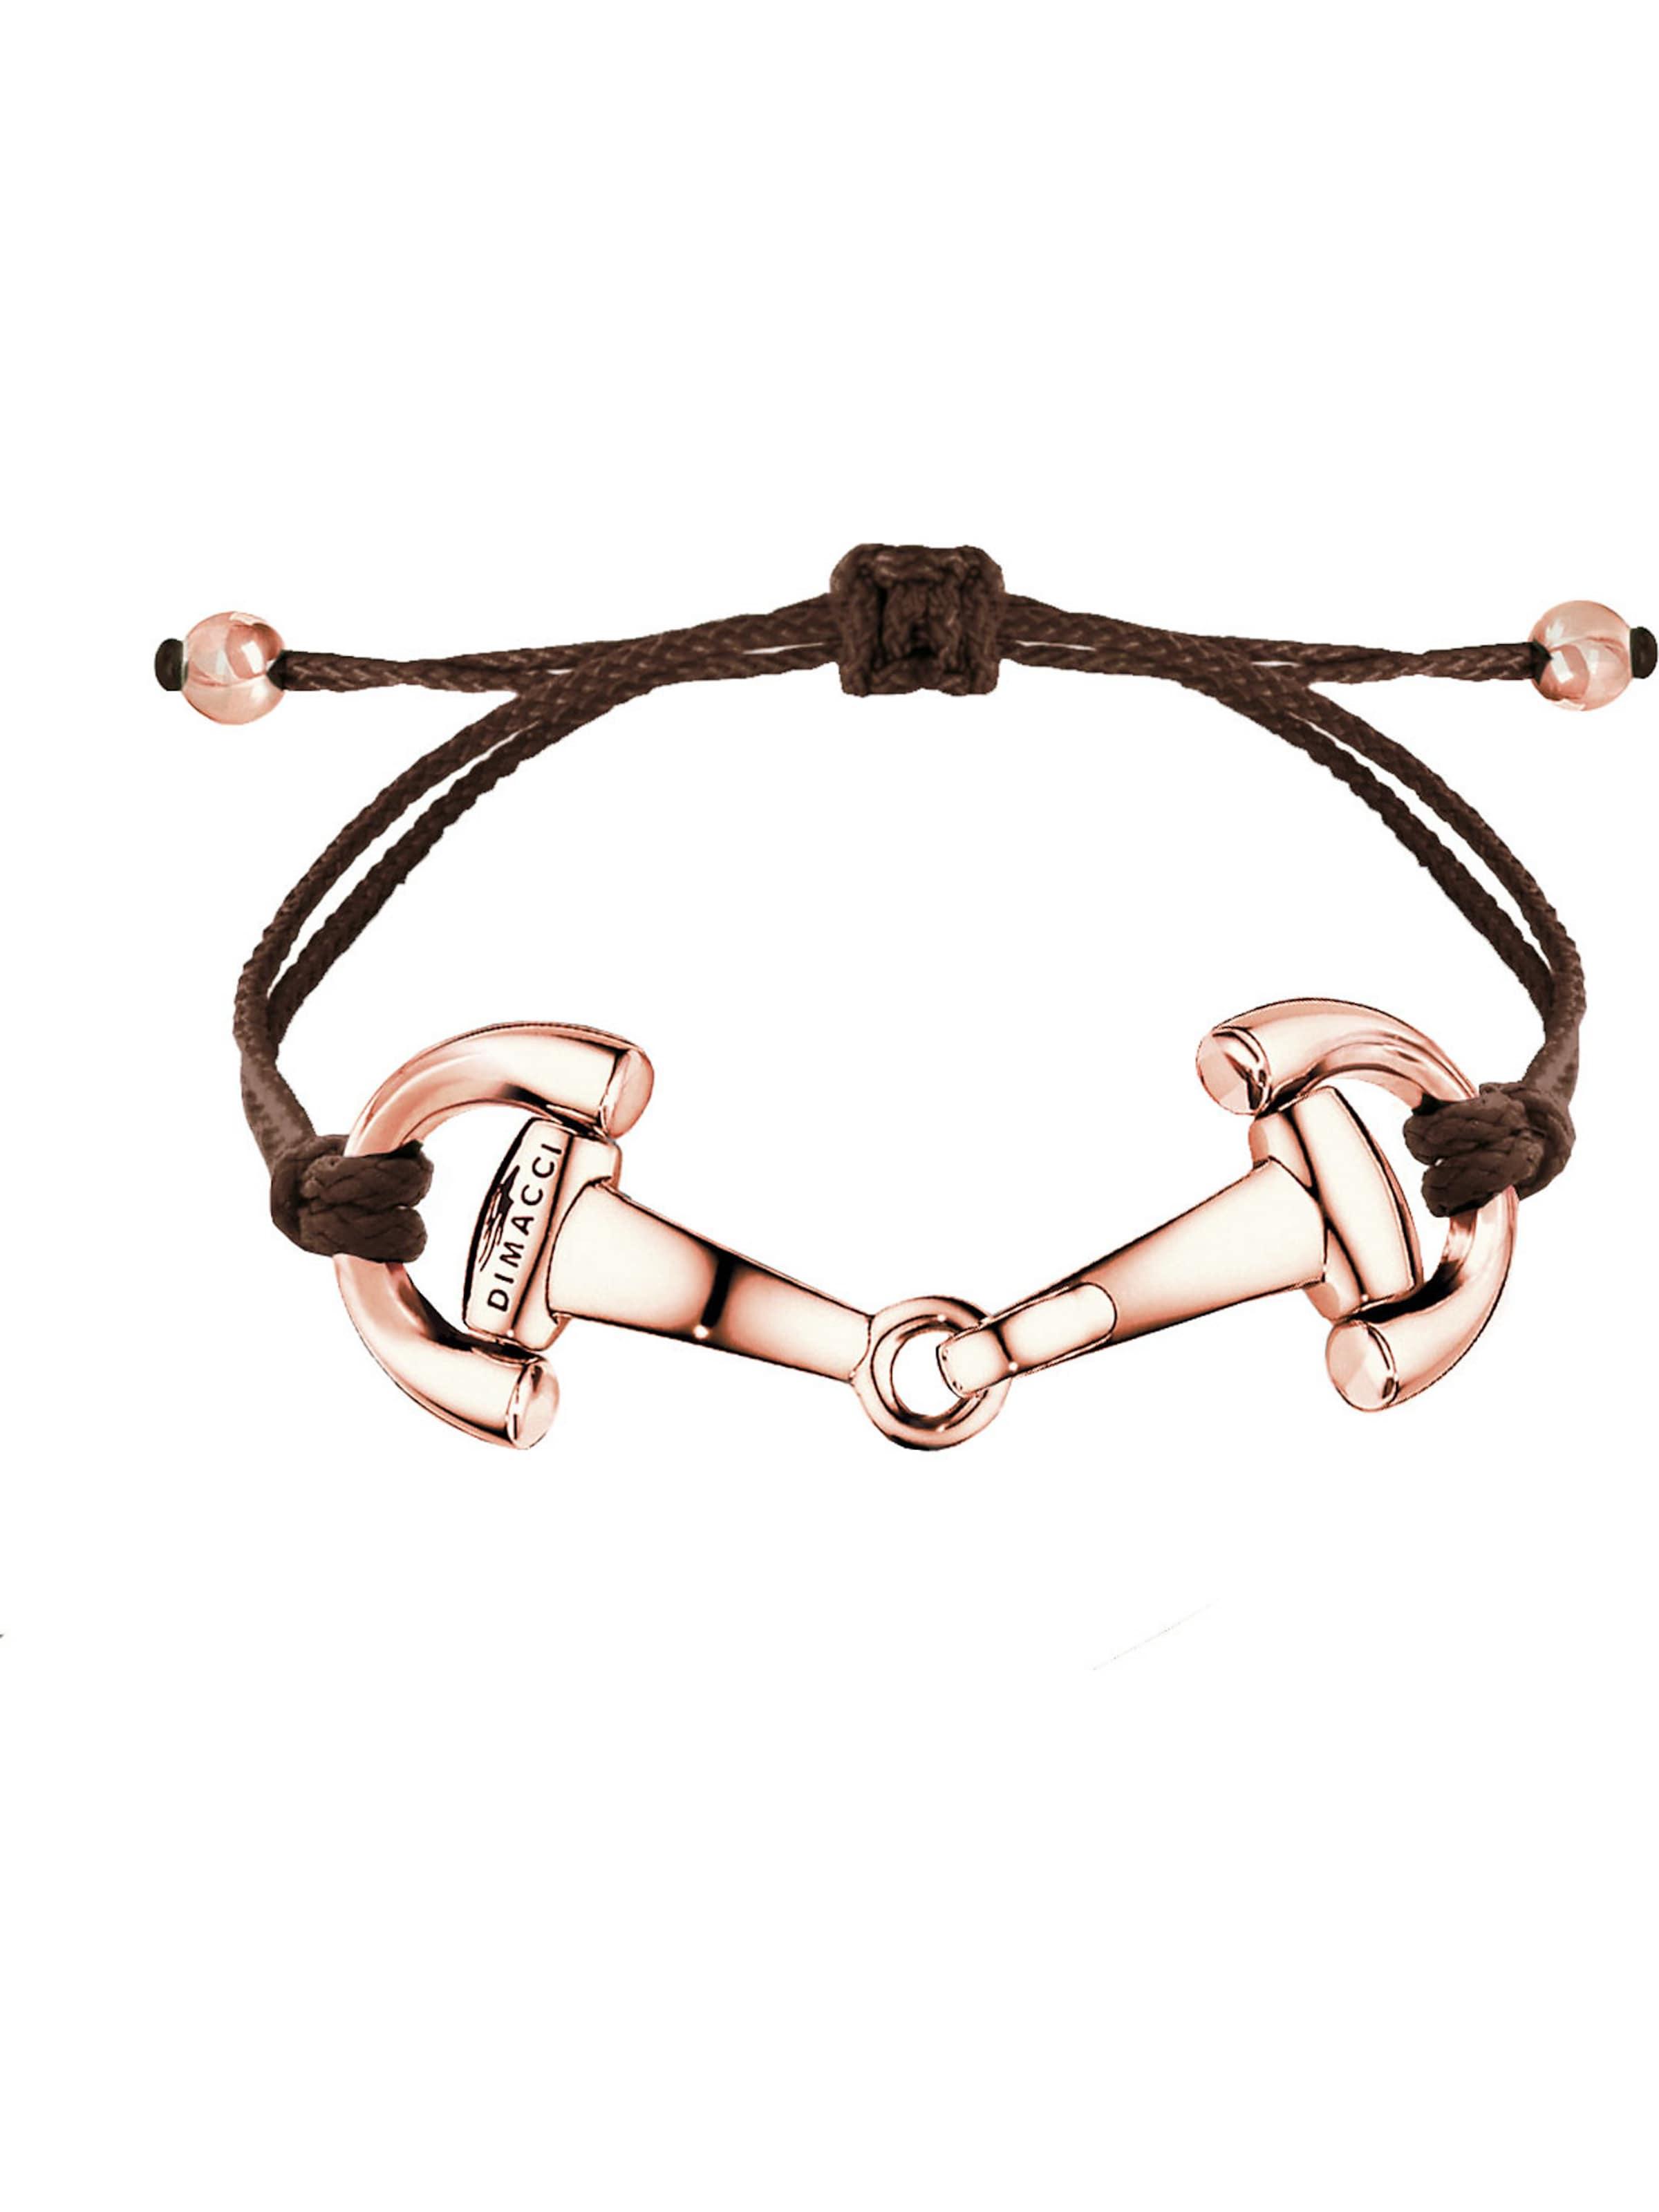 Armband Armband In In BraunRosegold BraunRosegold BraunRosegold Armband In Dimacci Dimacci Dimacci 0nmN8yvwO